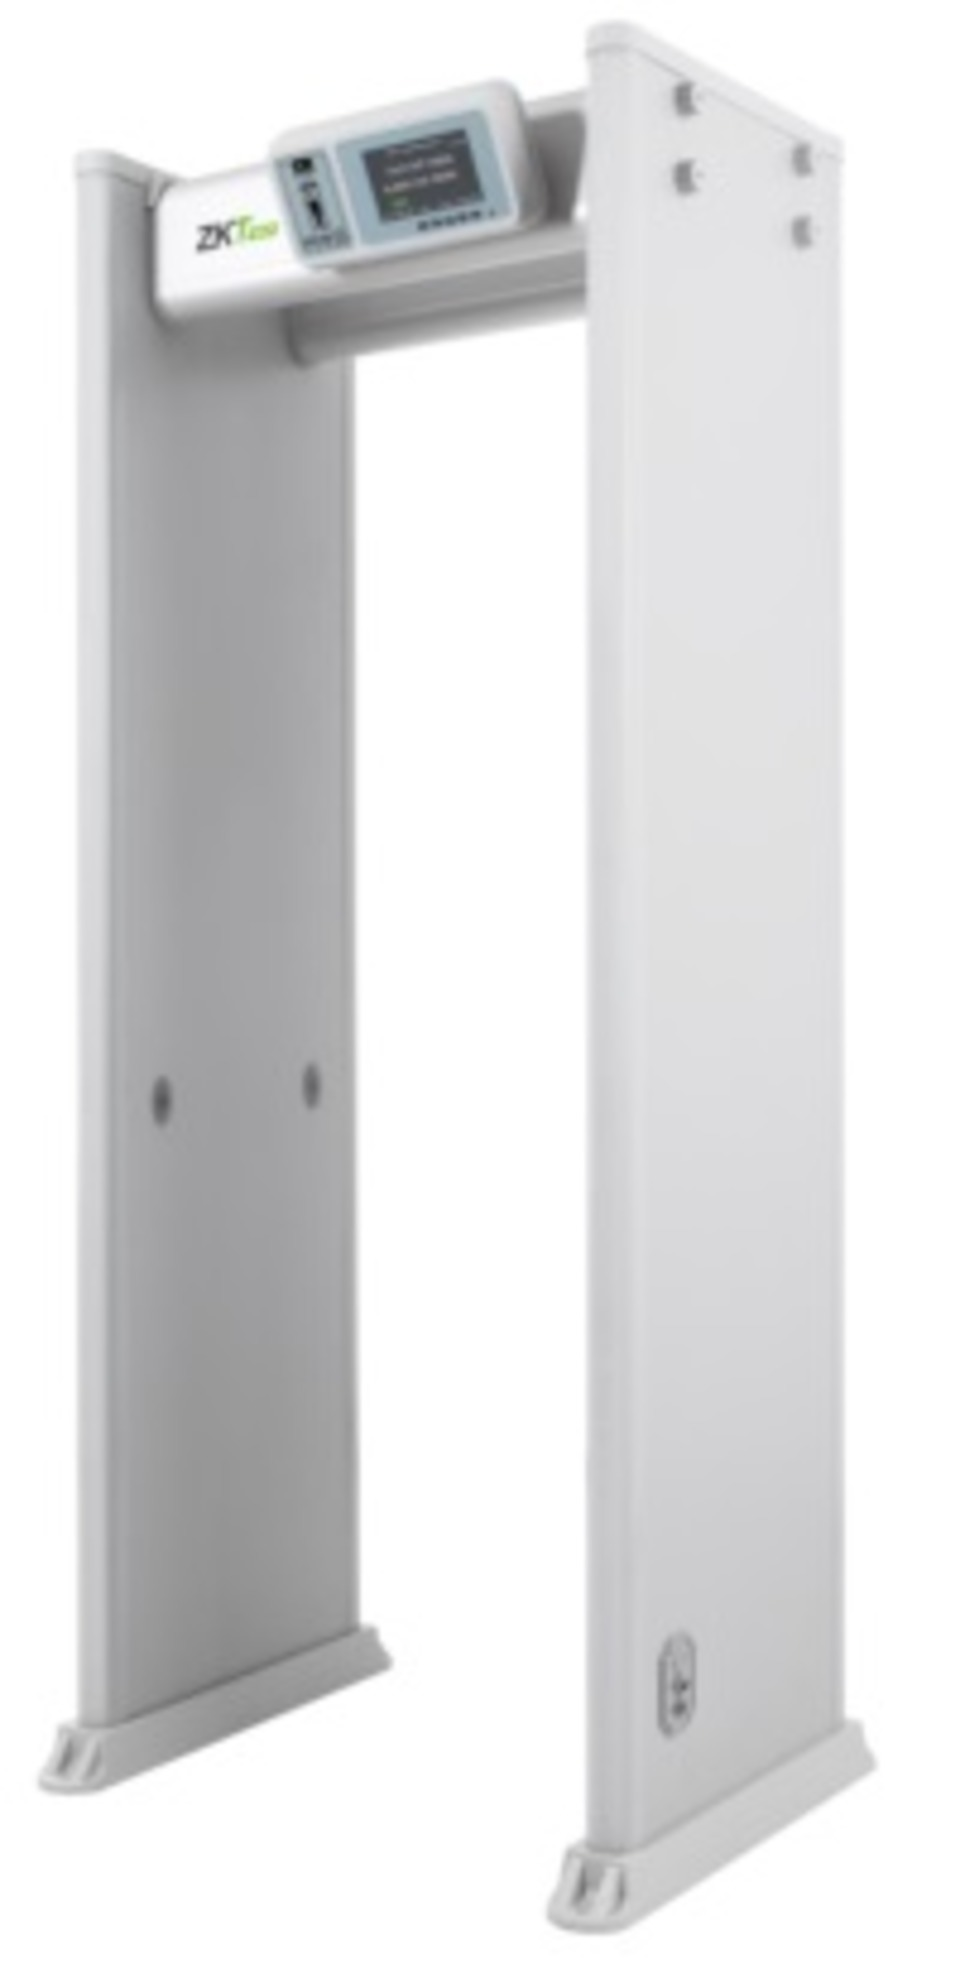 ZKTeco USA ZKAccess' WMD433 Walk-Through Metal Detector in